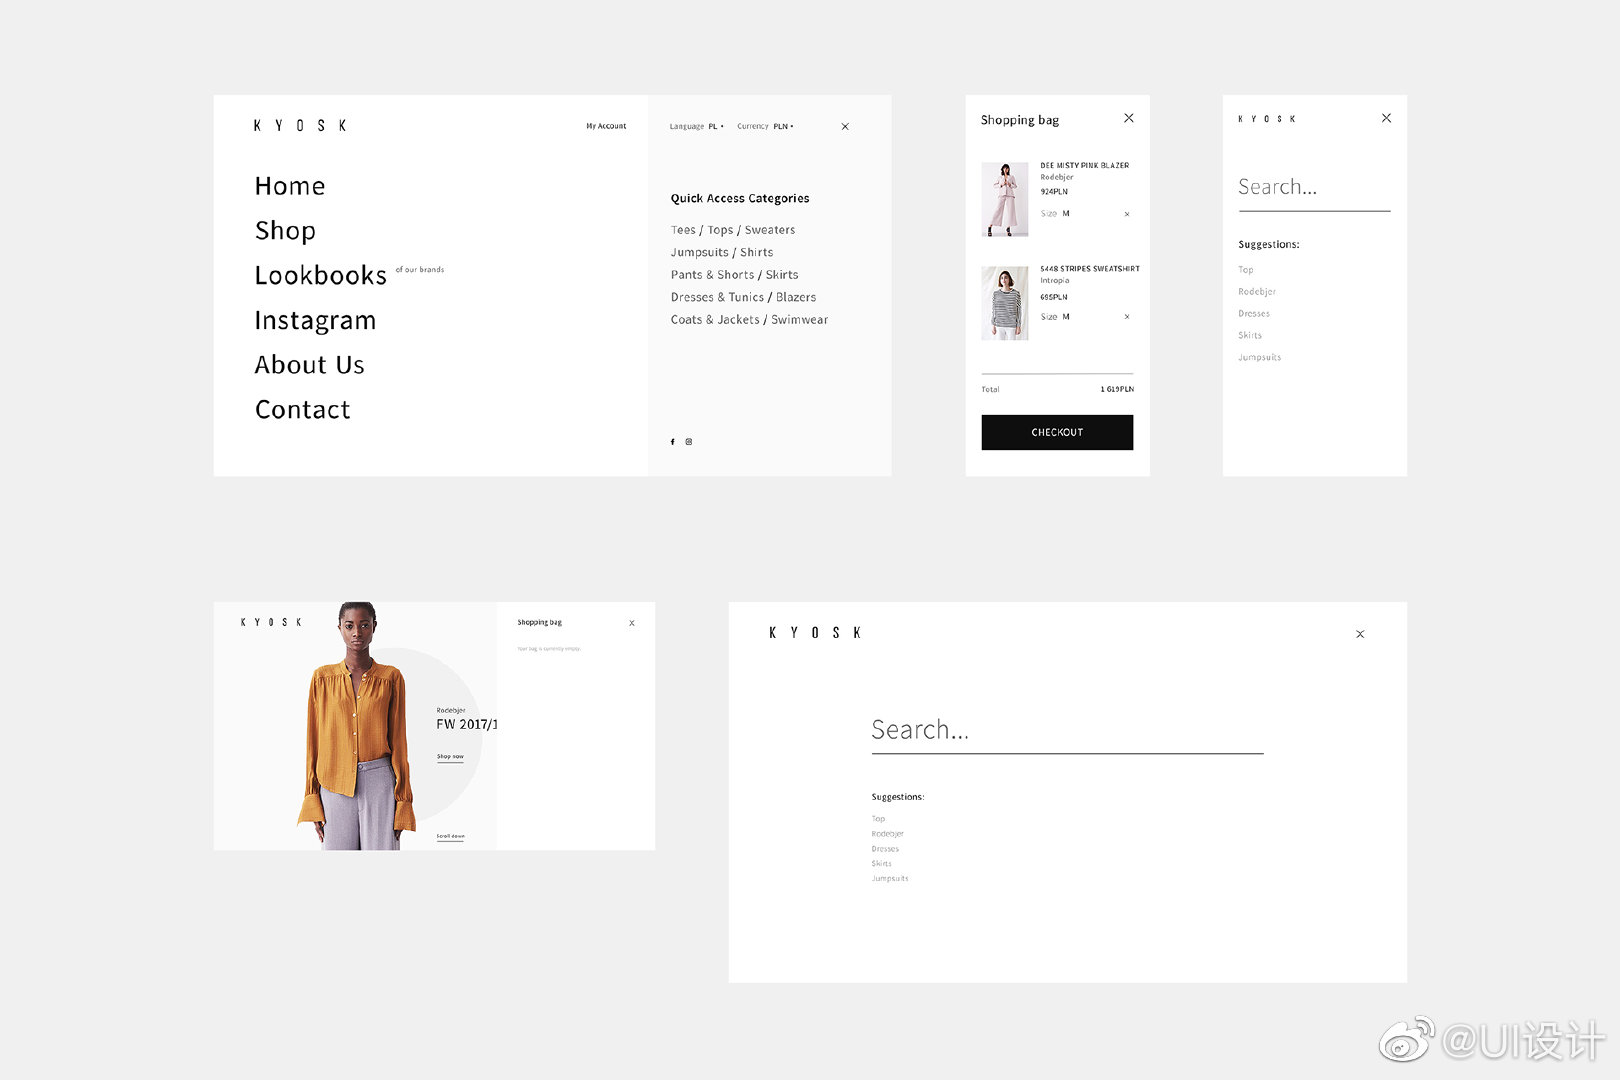 KYOSK Multibrand Store官方网站WEB灵感设计分享